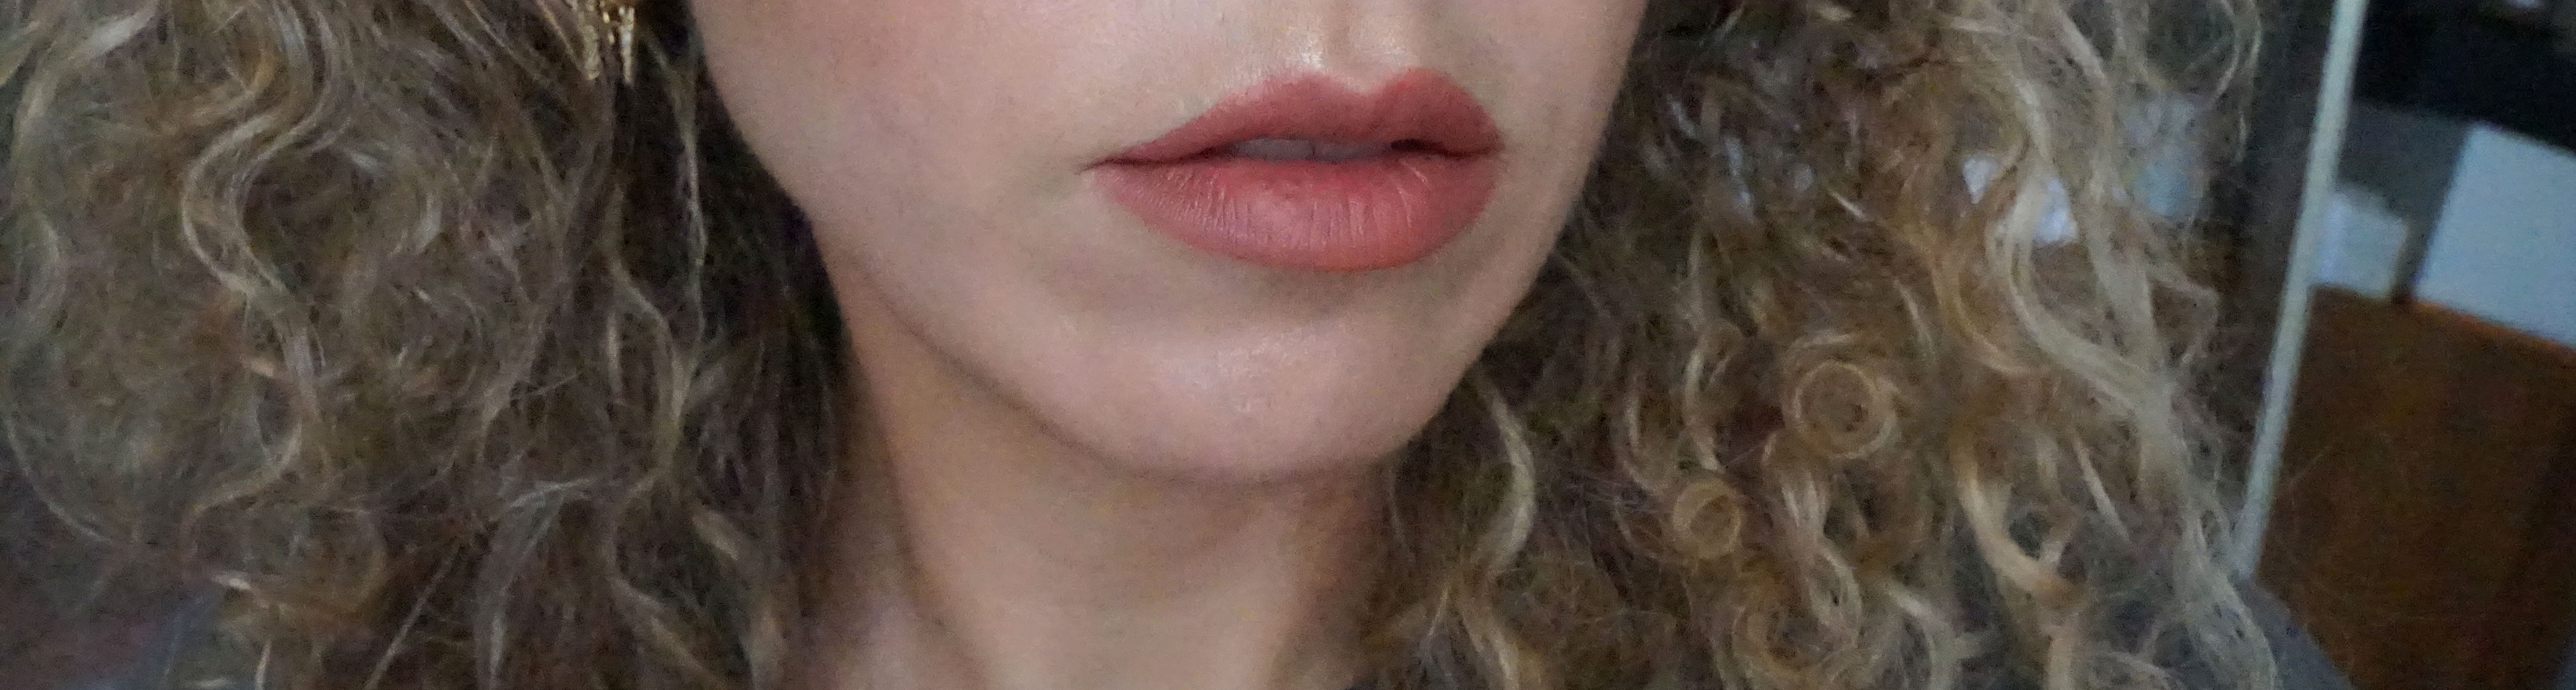 Mac Powder Kiss Lipsticks (New Shades) - Makeup-Sessions